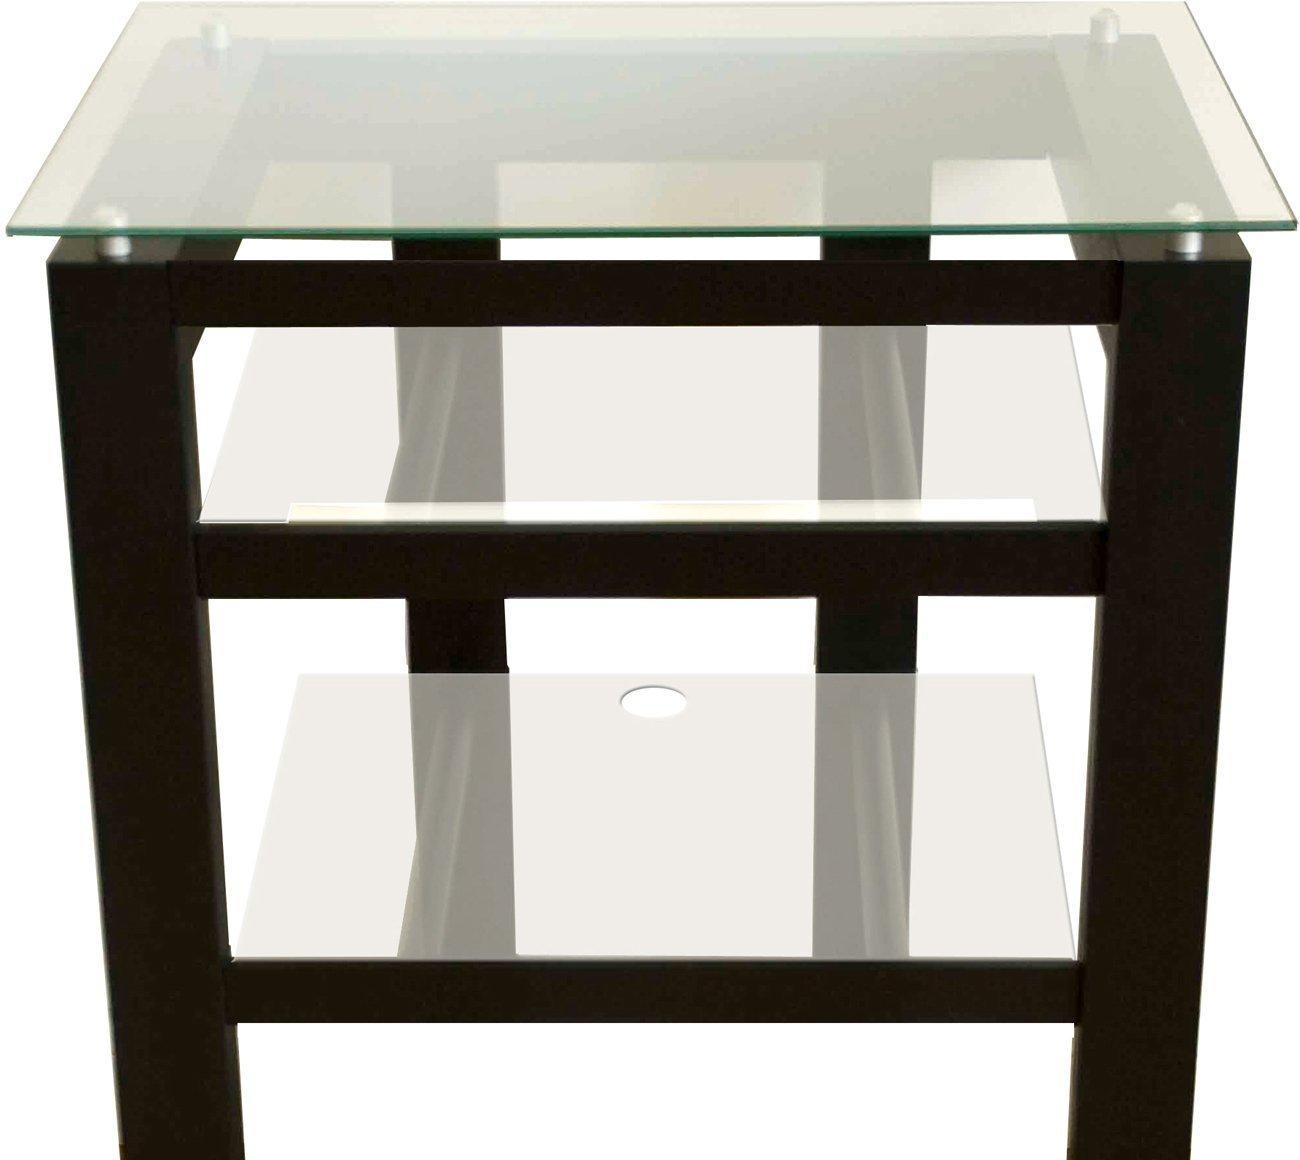 26 Inch Low Profile Flat Screen TV Stand - Glass Shelf